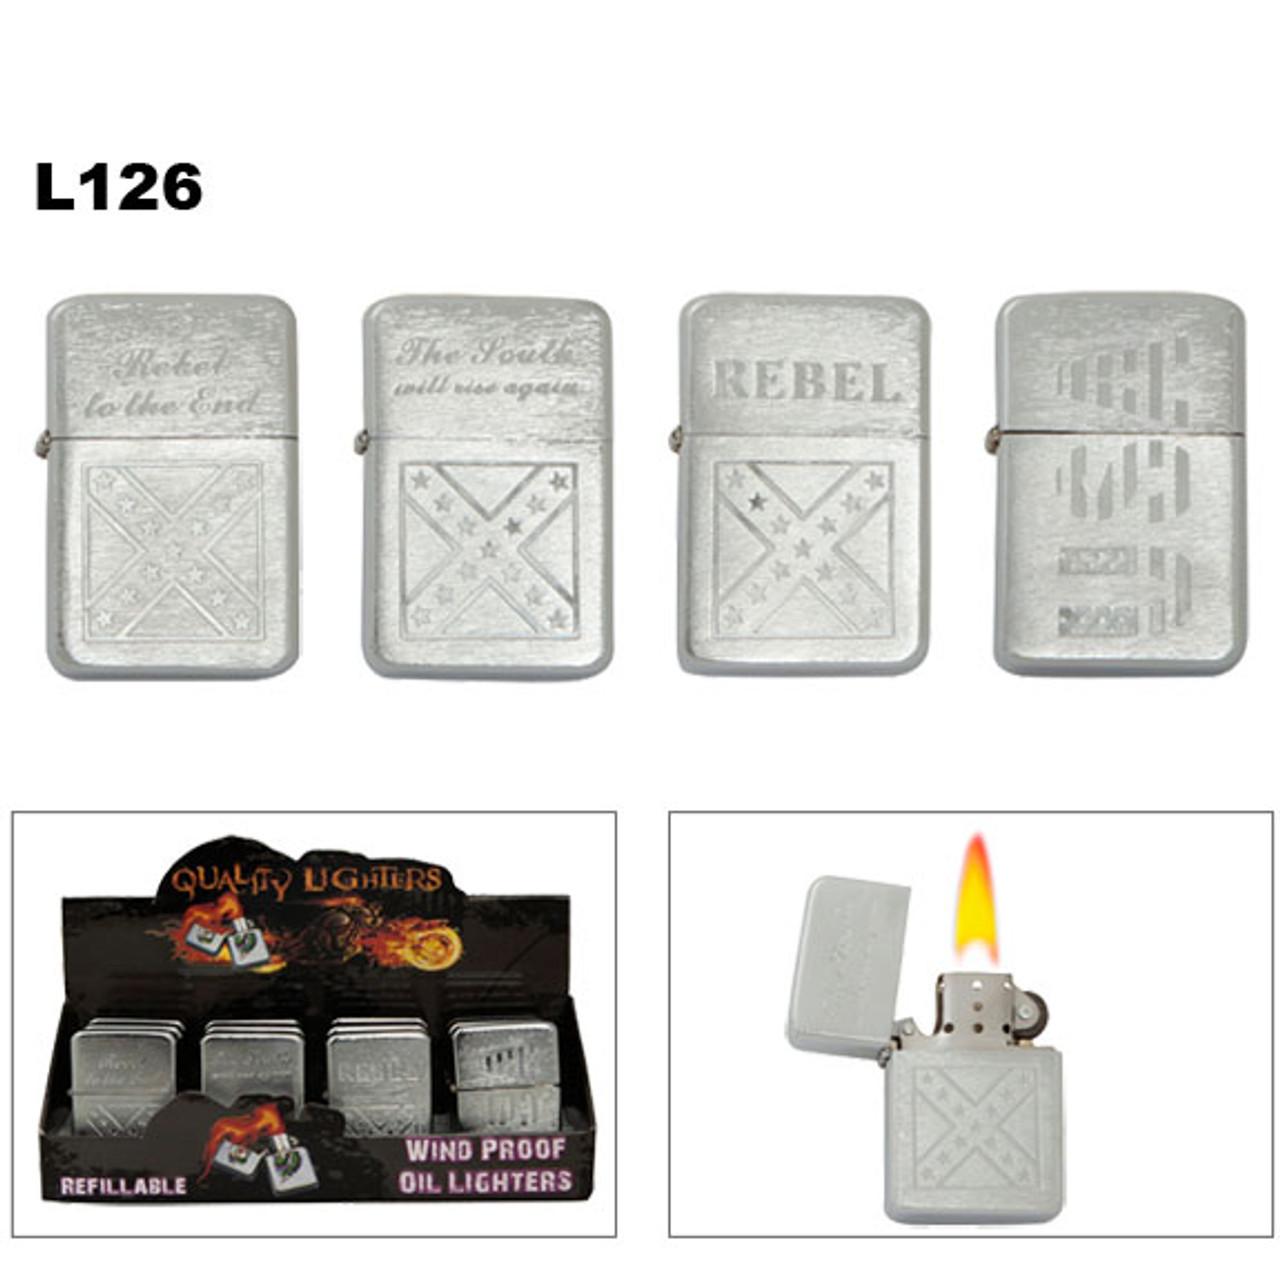 Engraved Oil Lighters Wholesale | Rebel | USA